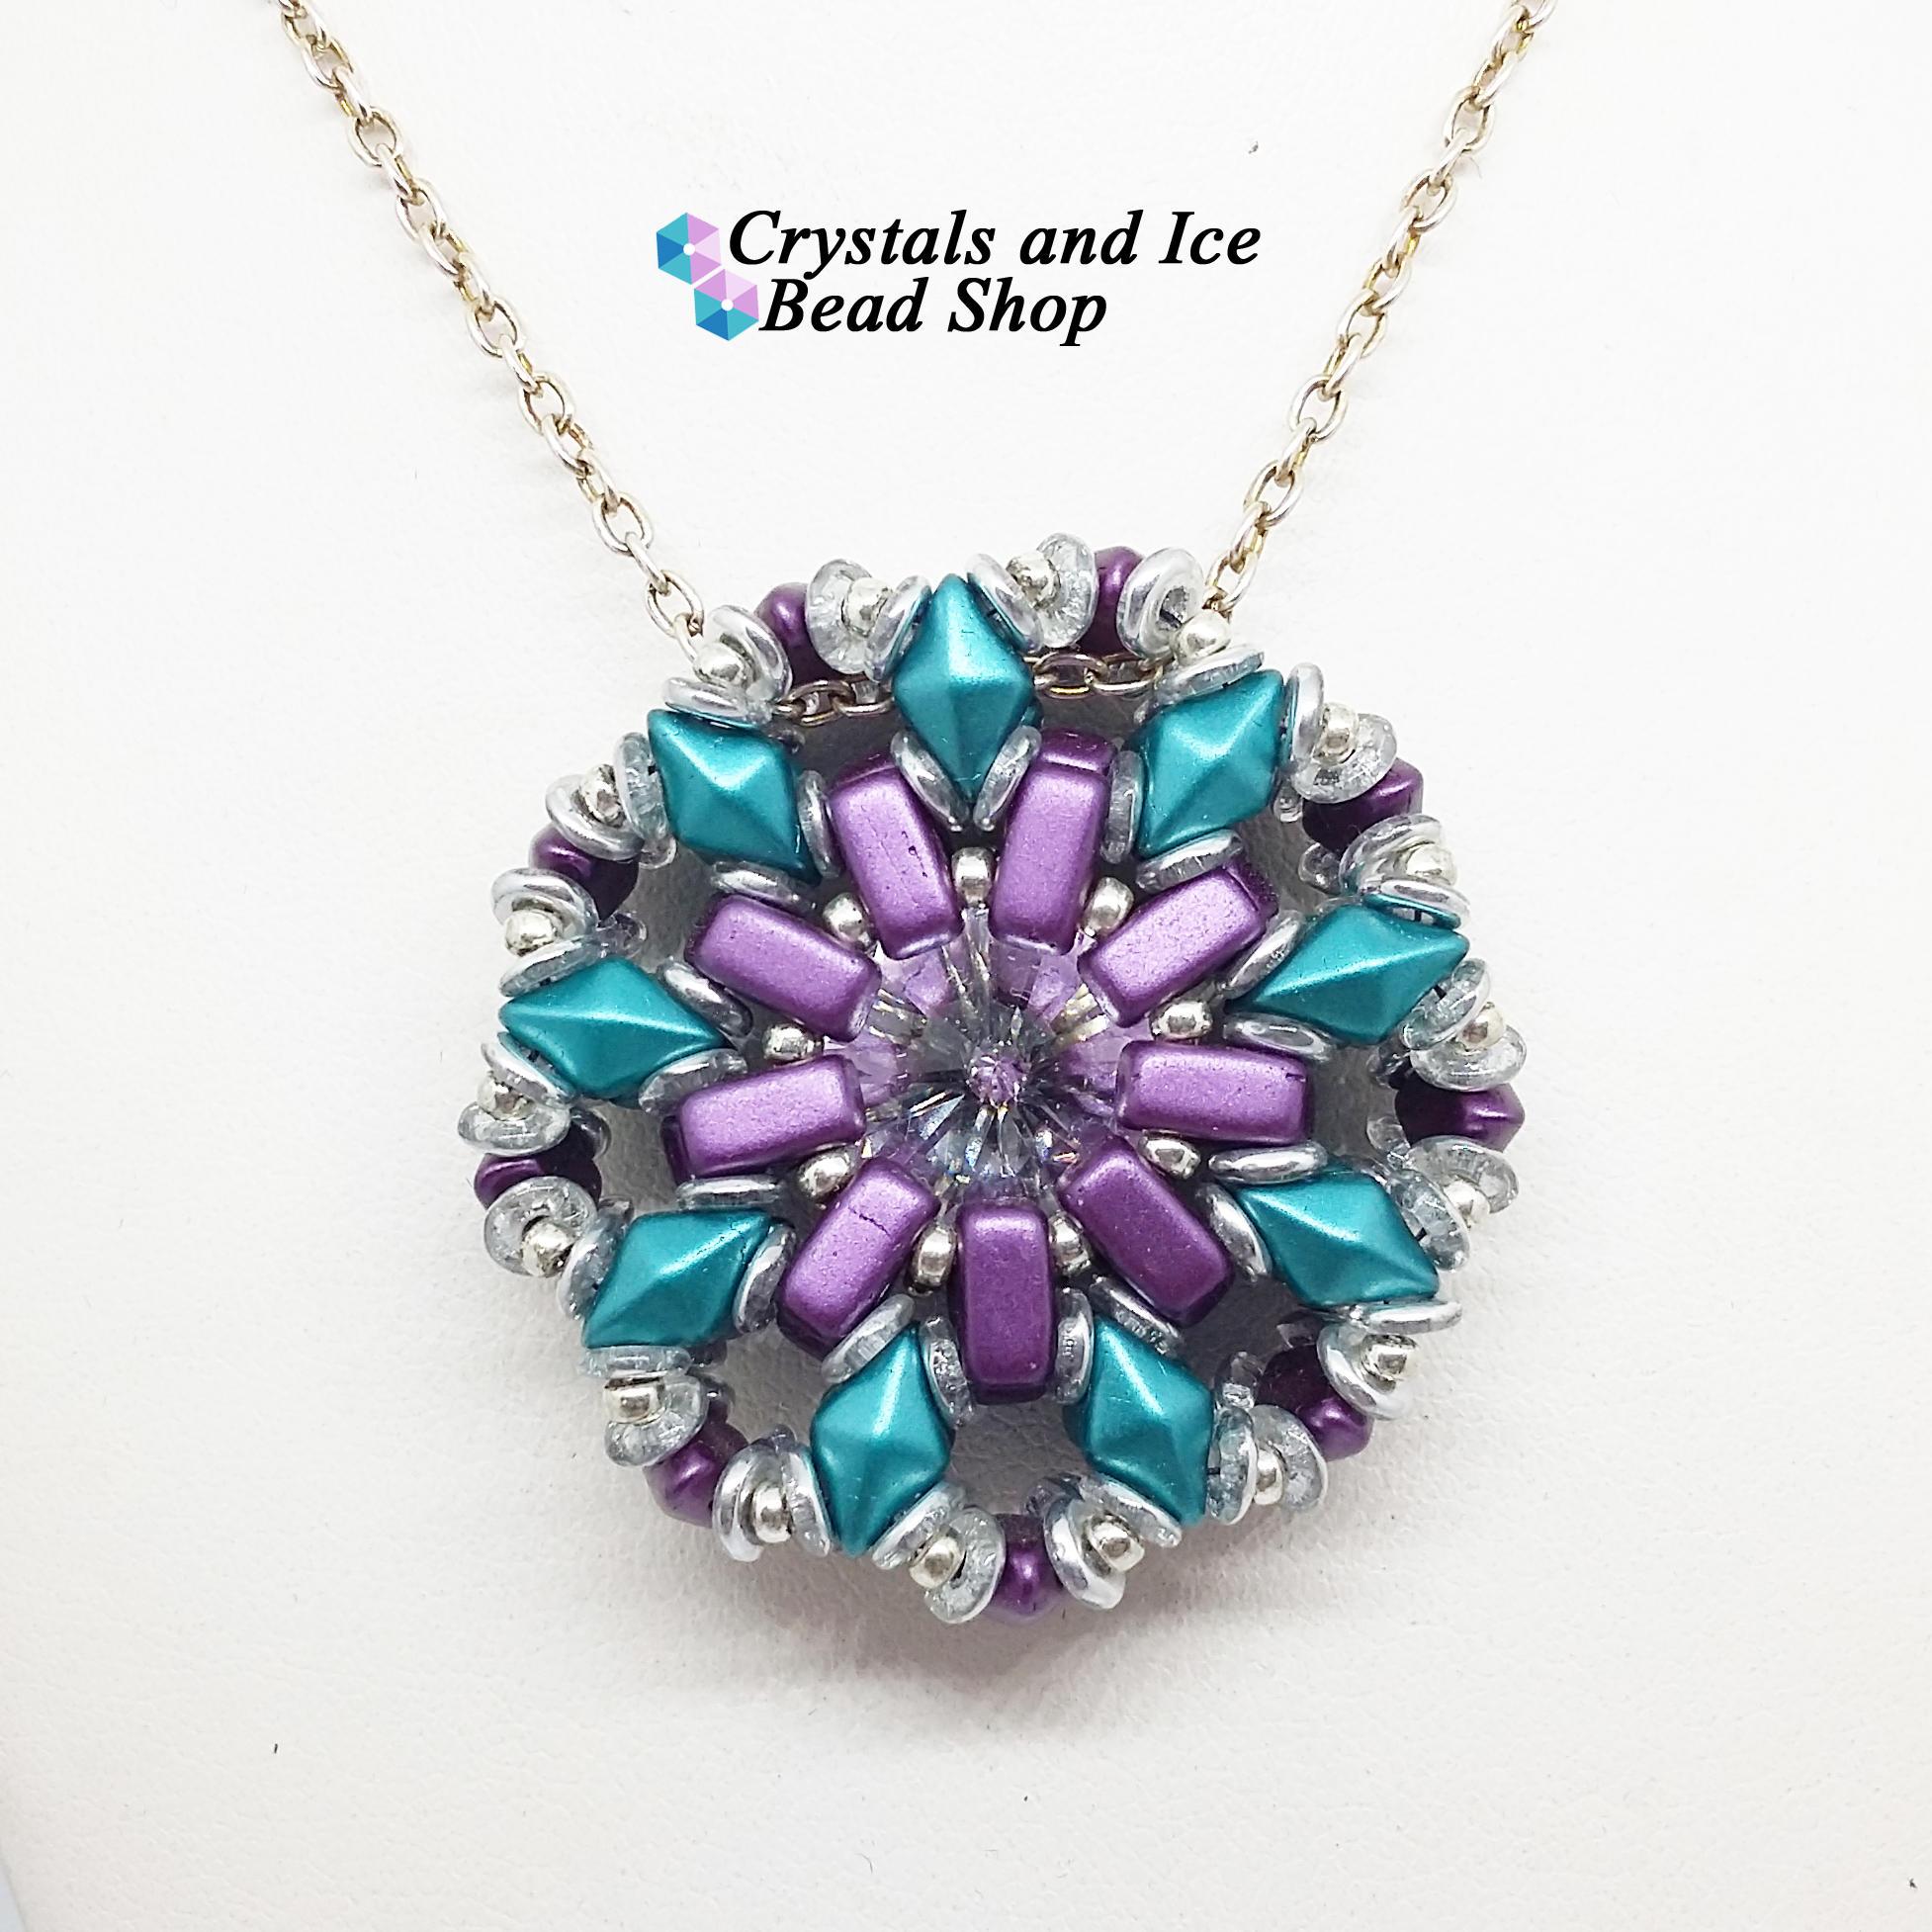 8b1e5a213cbf Diamond Celeste - Swarovski Rivoli Pendant Kit with DiamonDuo Beads -  Wimbledon